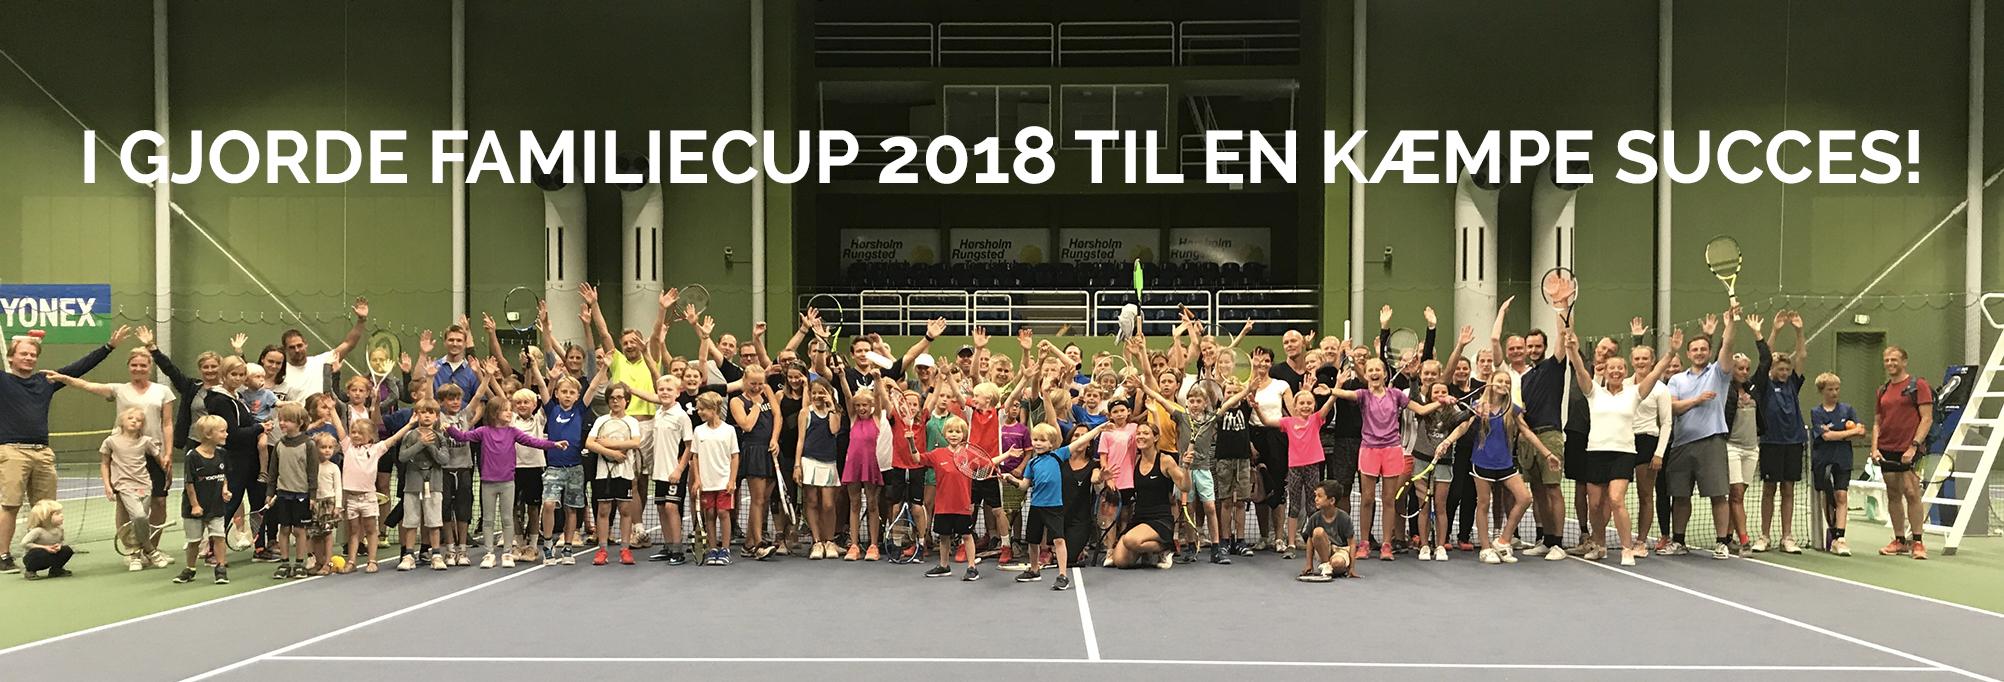 familiecup-2018